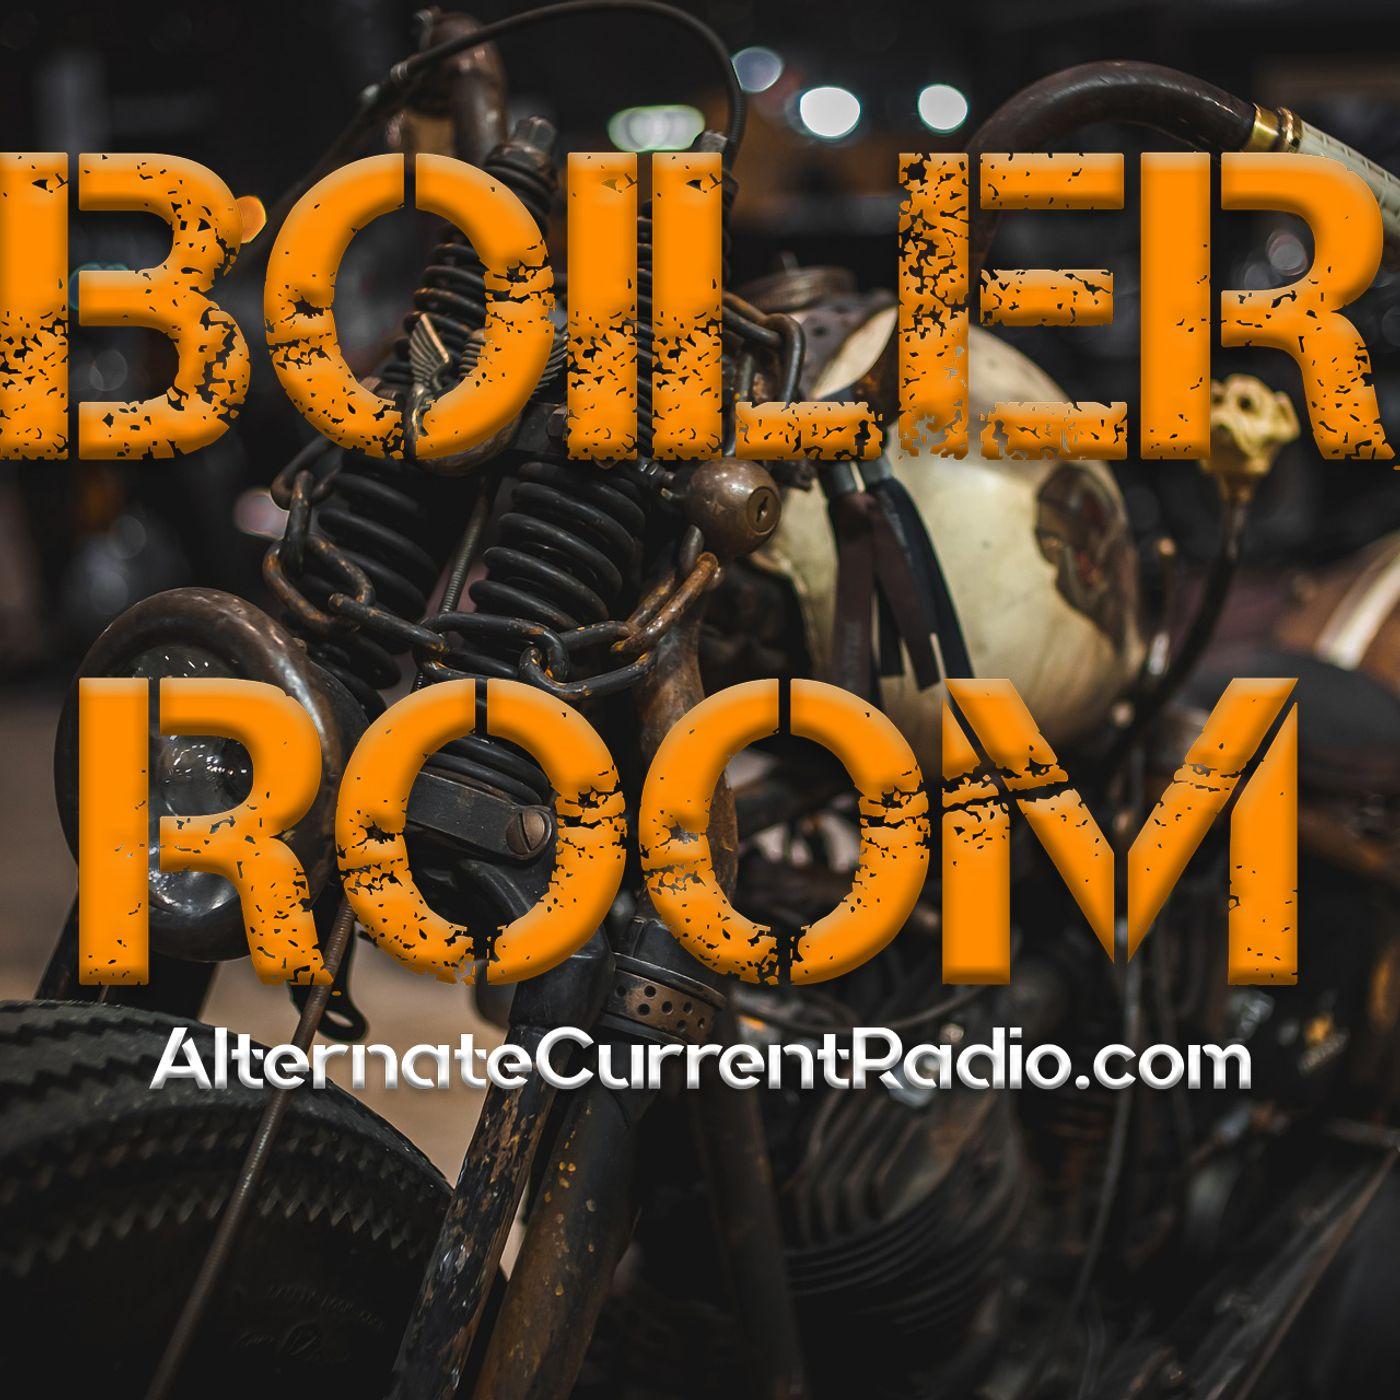 A Ruckus Among the Odd Mystical American Chopped & Mod'd Boiler Room